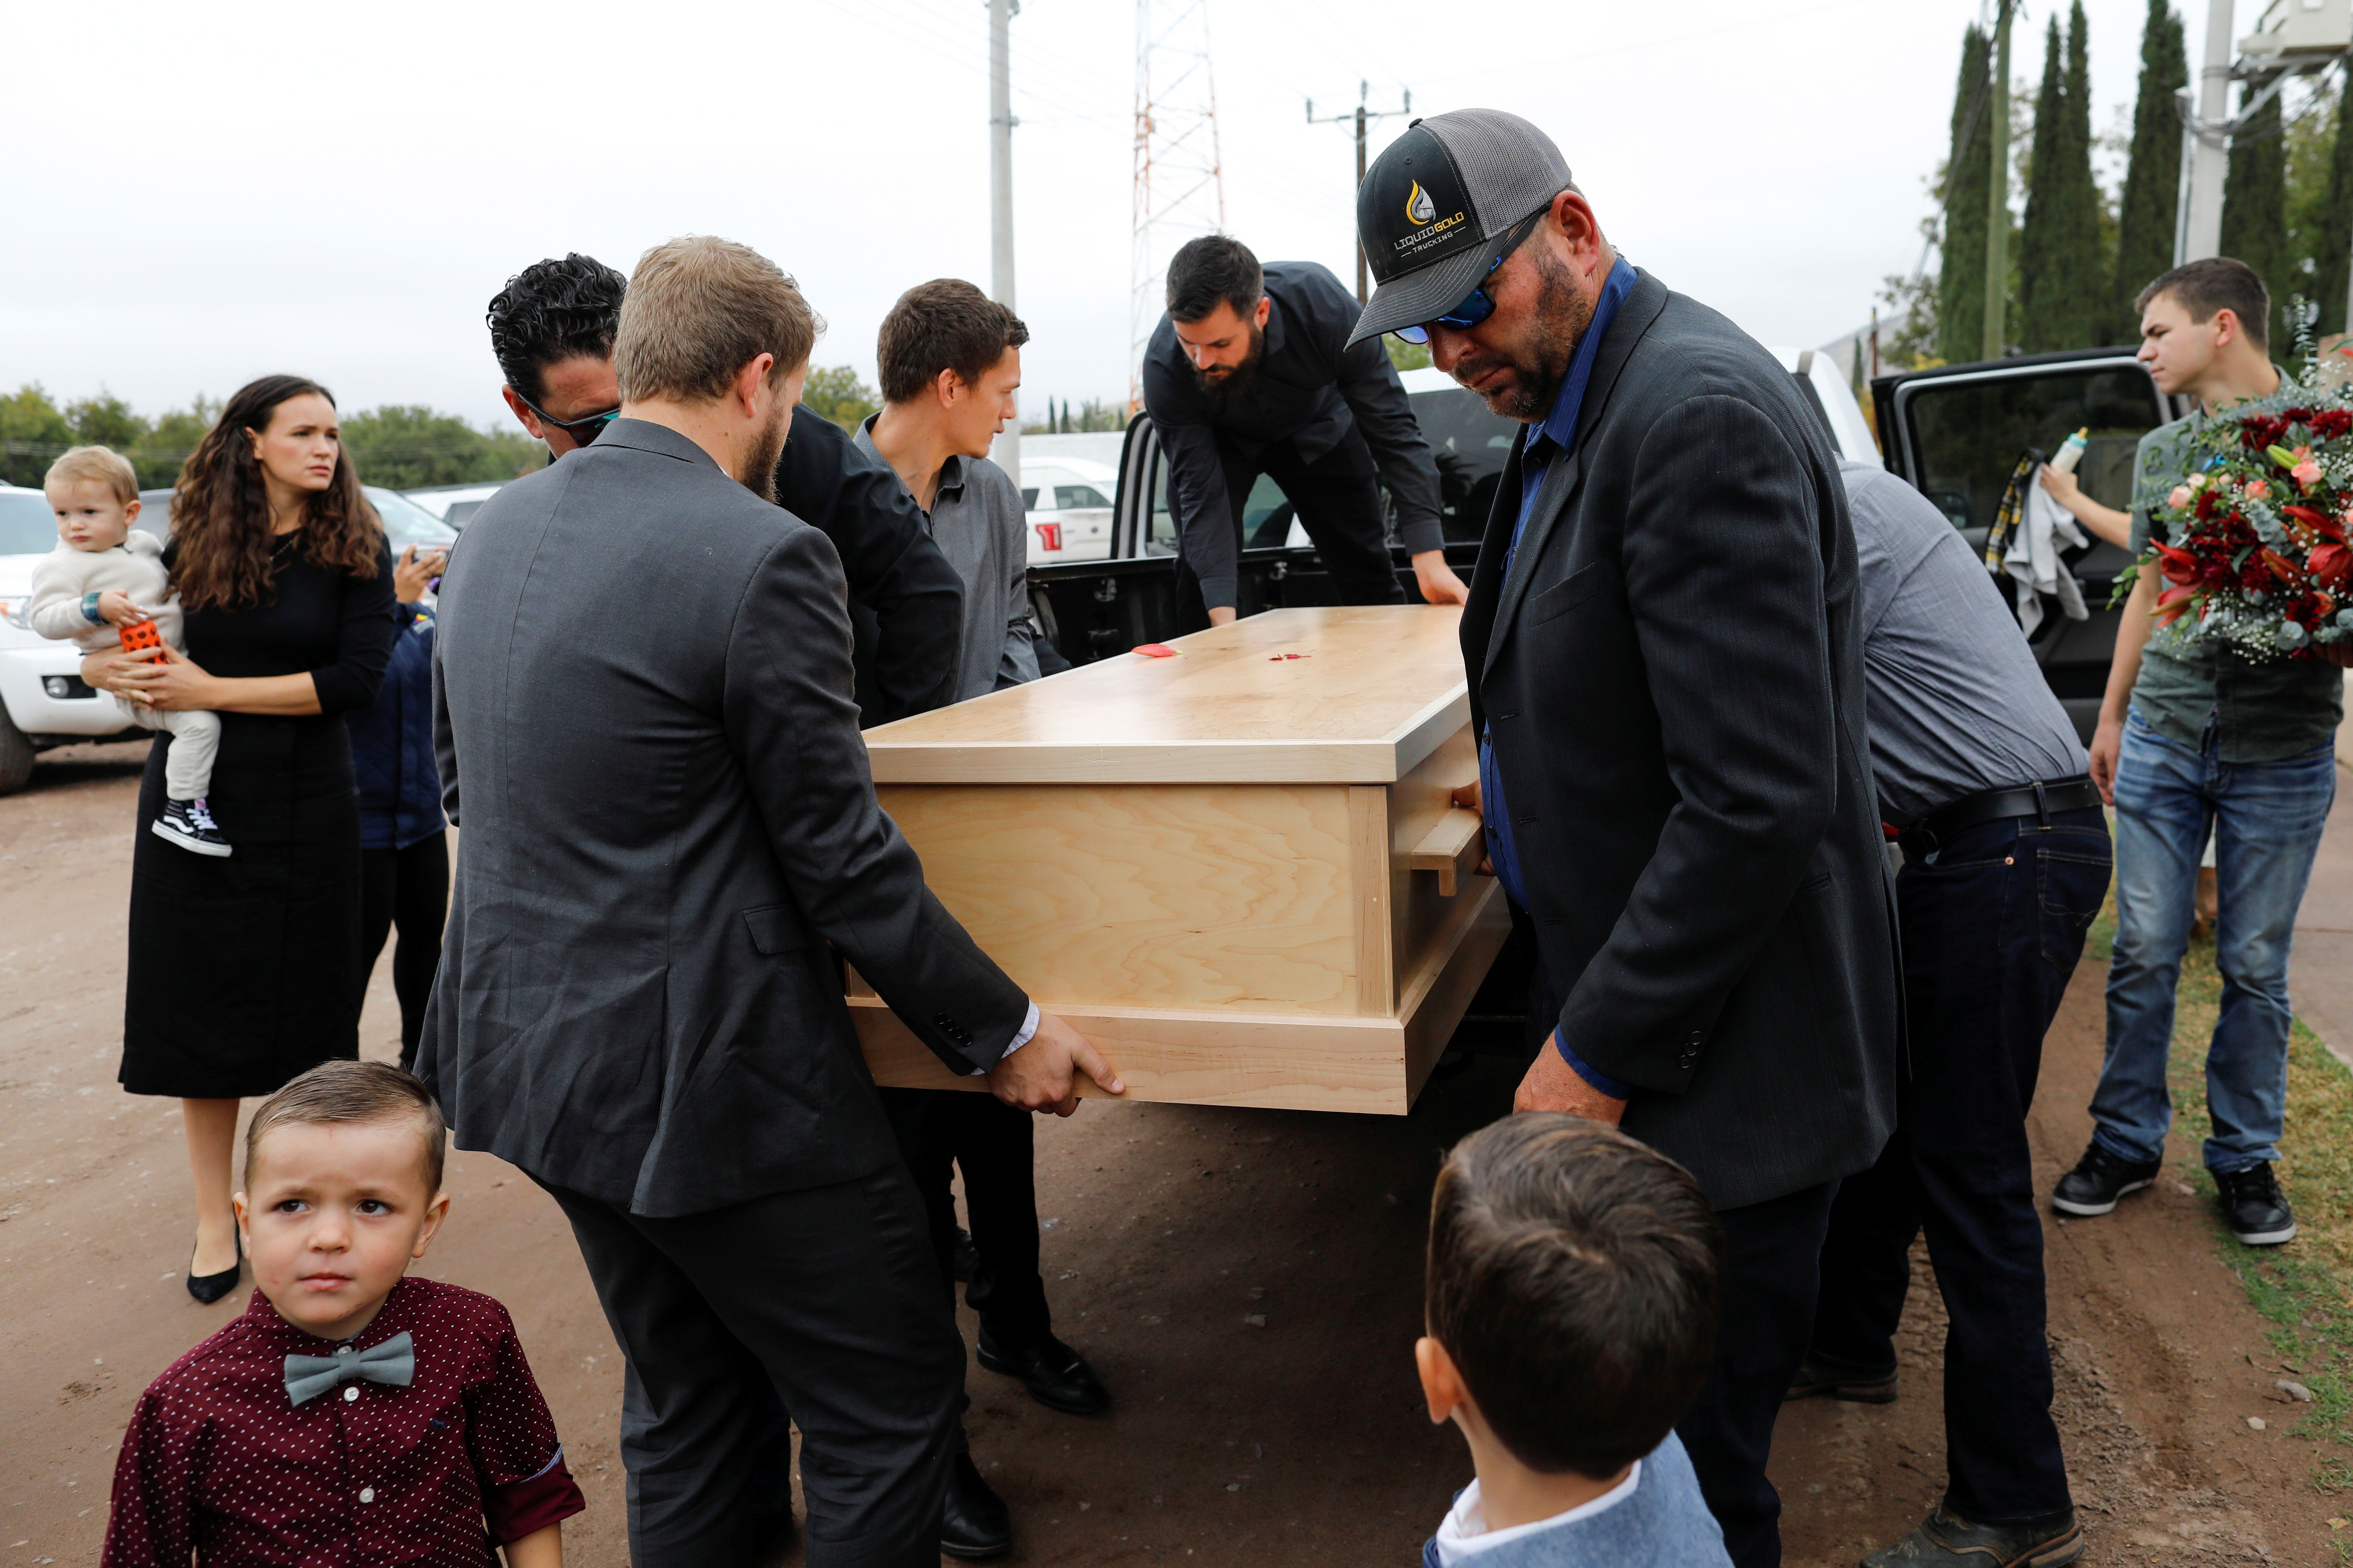 El ataúd de Christina Marie Langford Johnson es cargado por sus familiares (Fot:. REUTERS/Carlos Jasso)